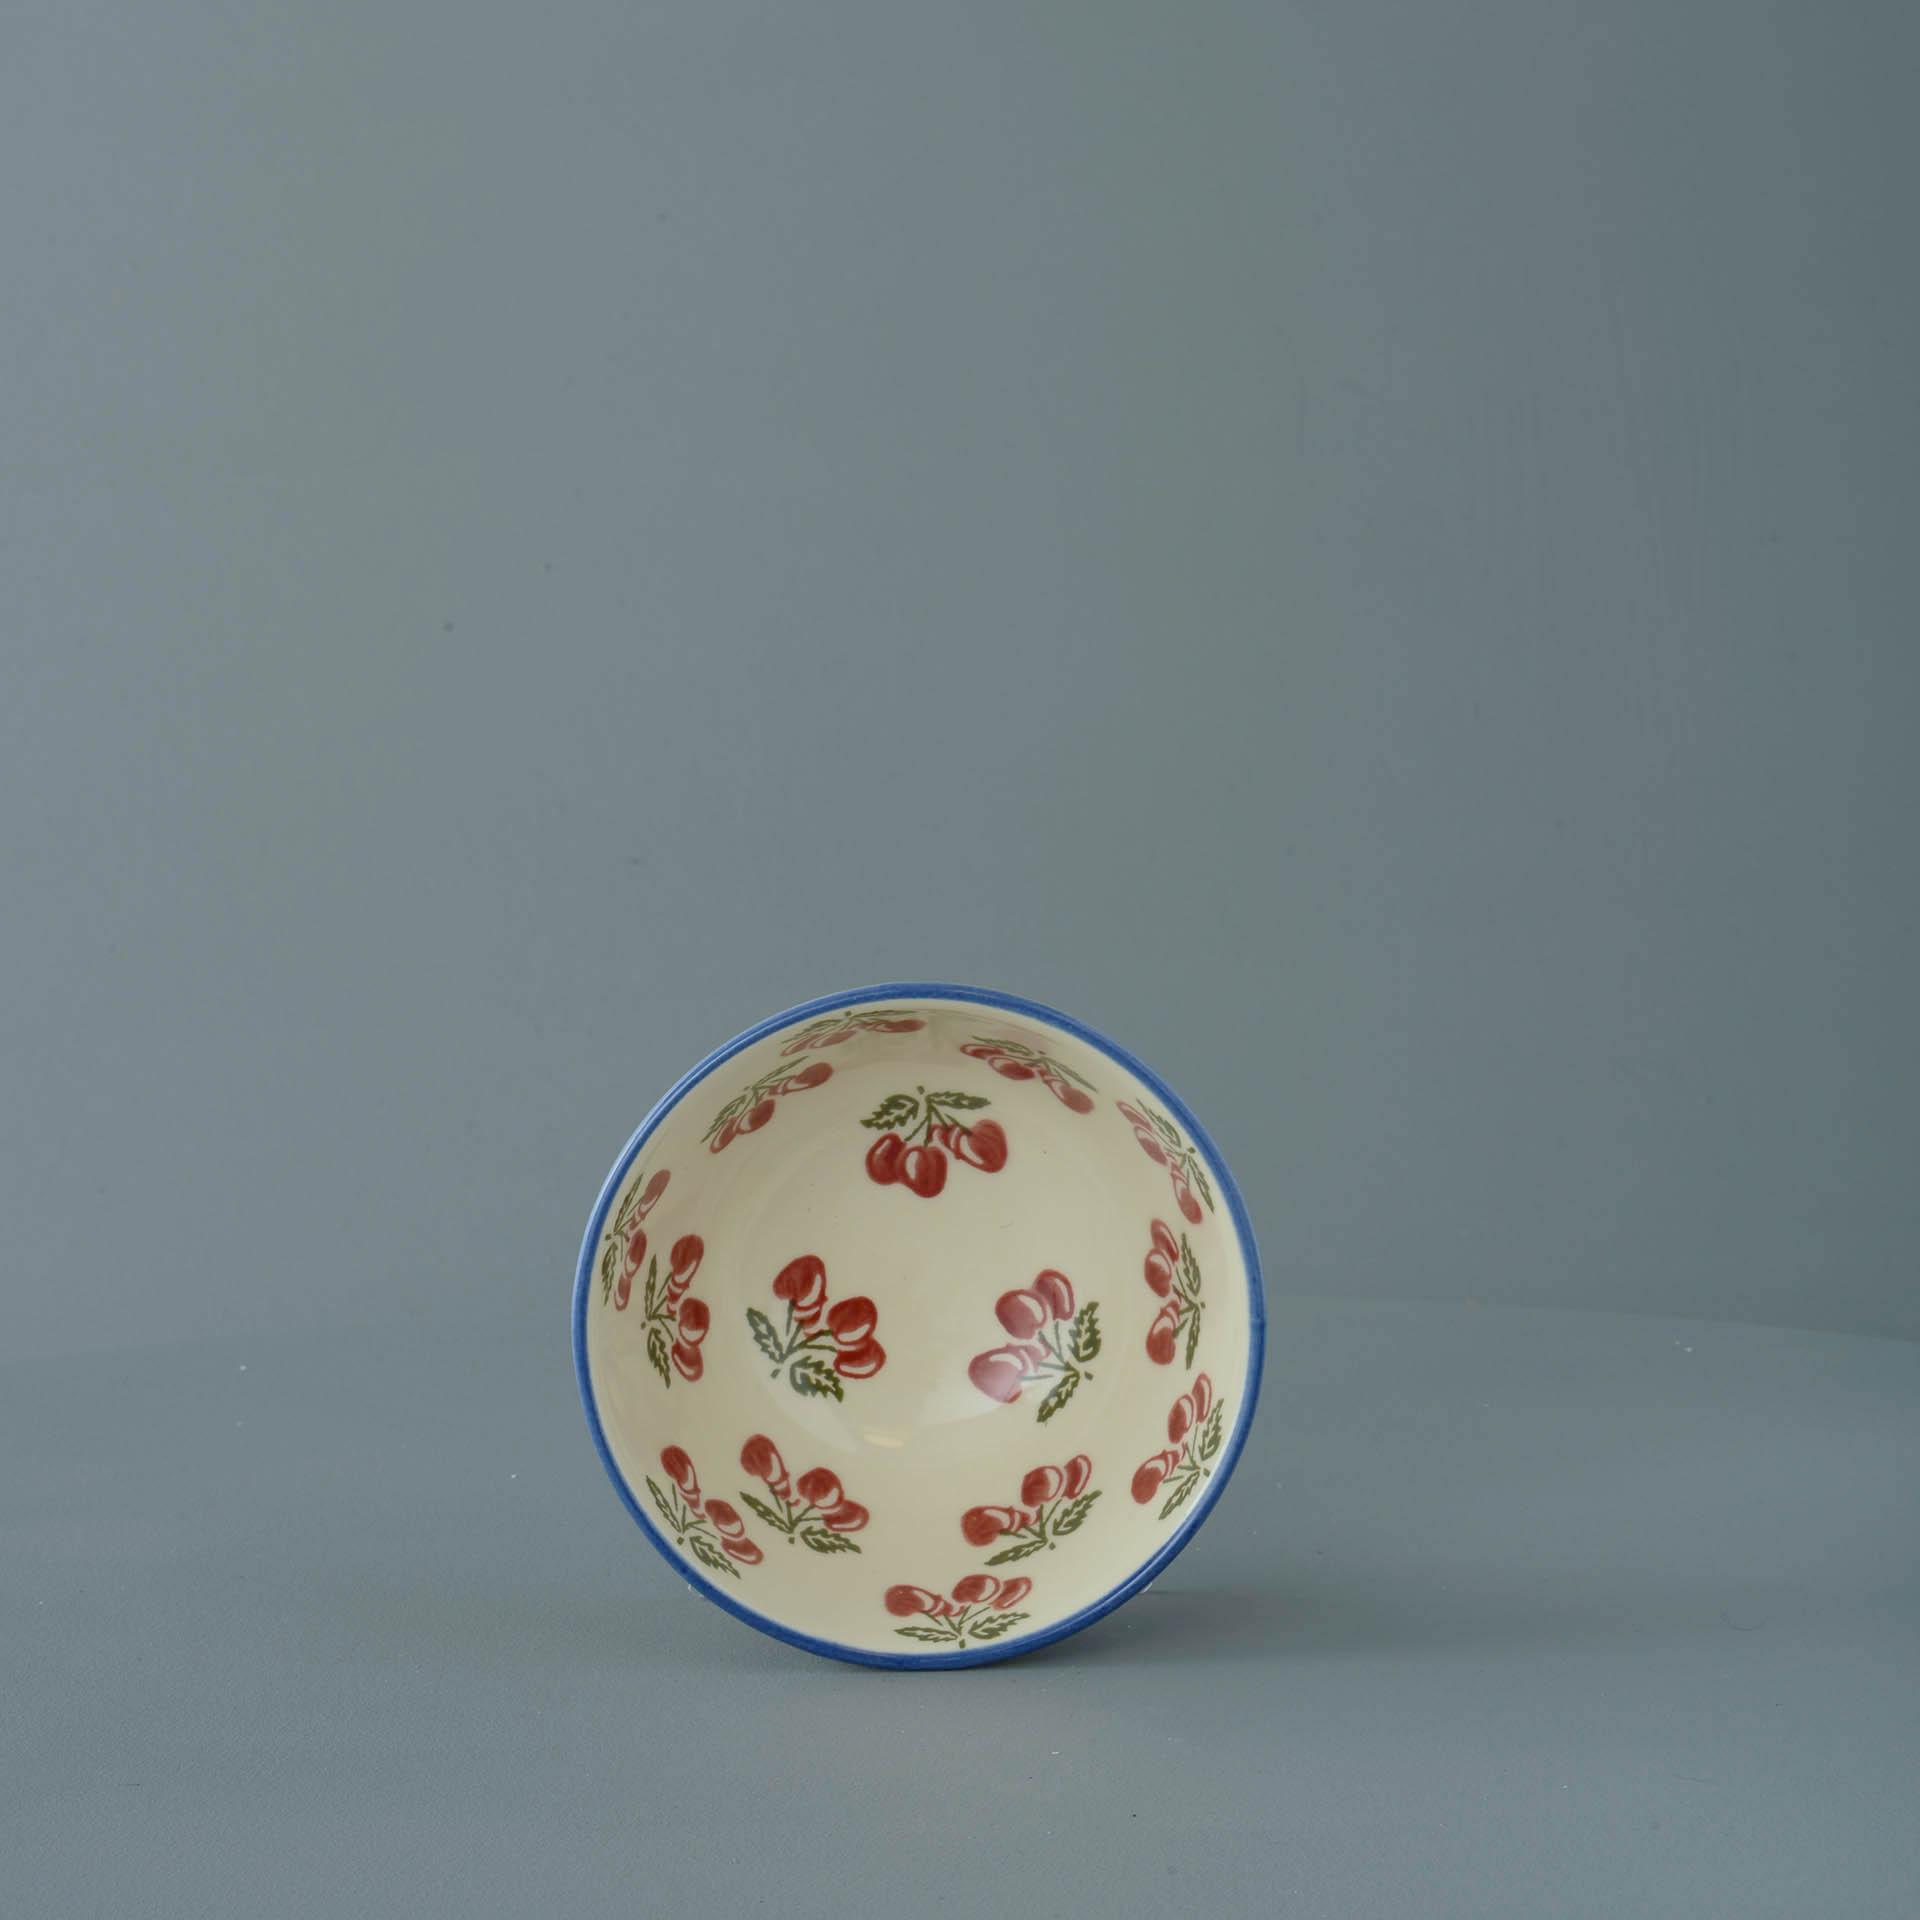 Cherries Small Bowl 6.5 x 12 cm